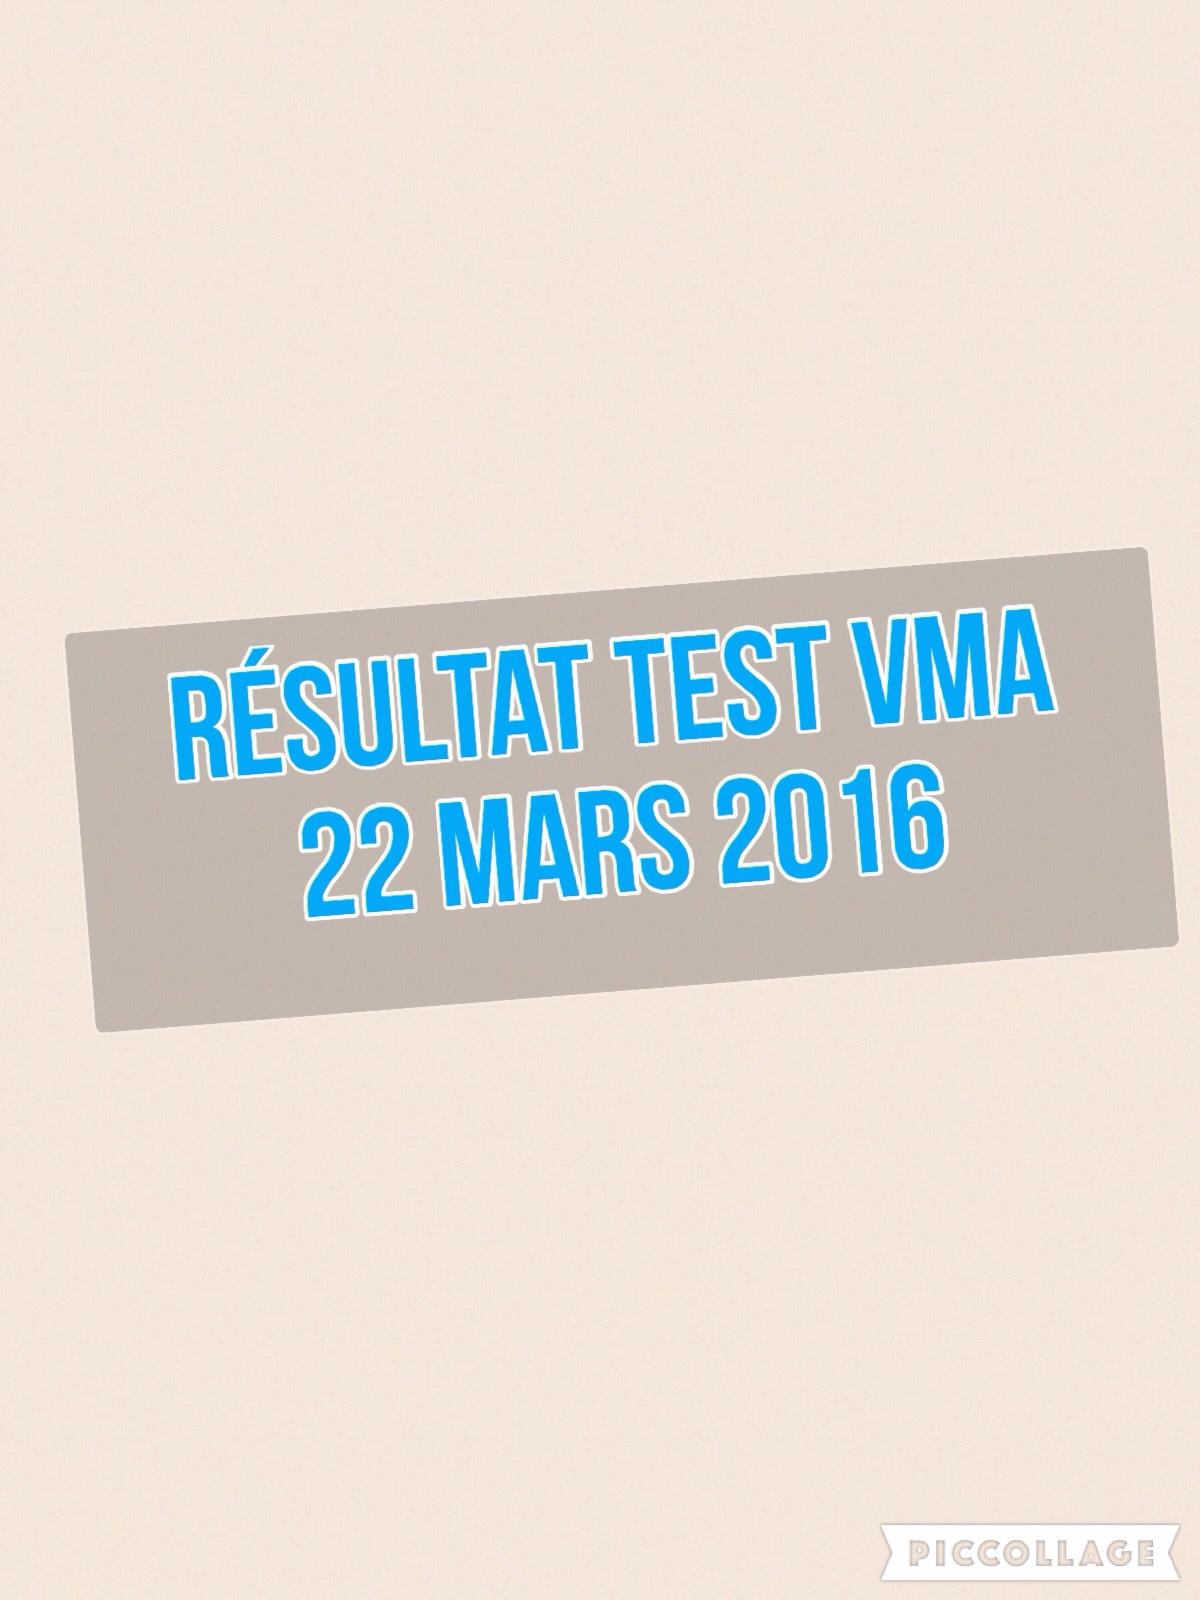 Résultat Test VMA du 22 mars 2016